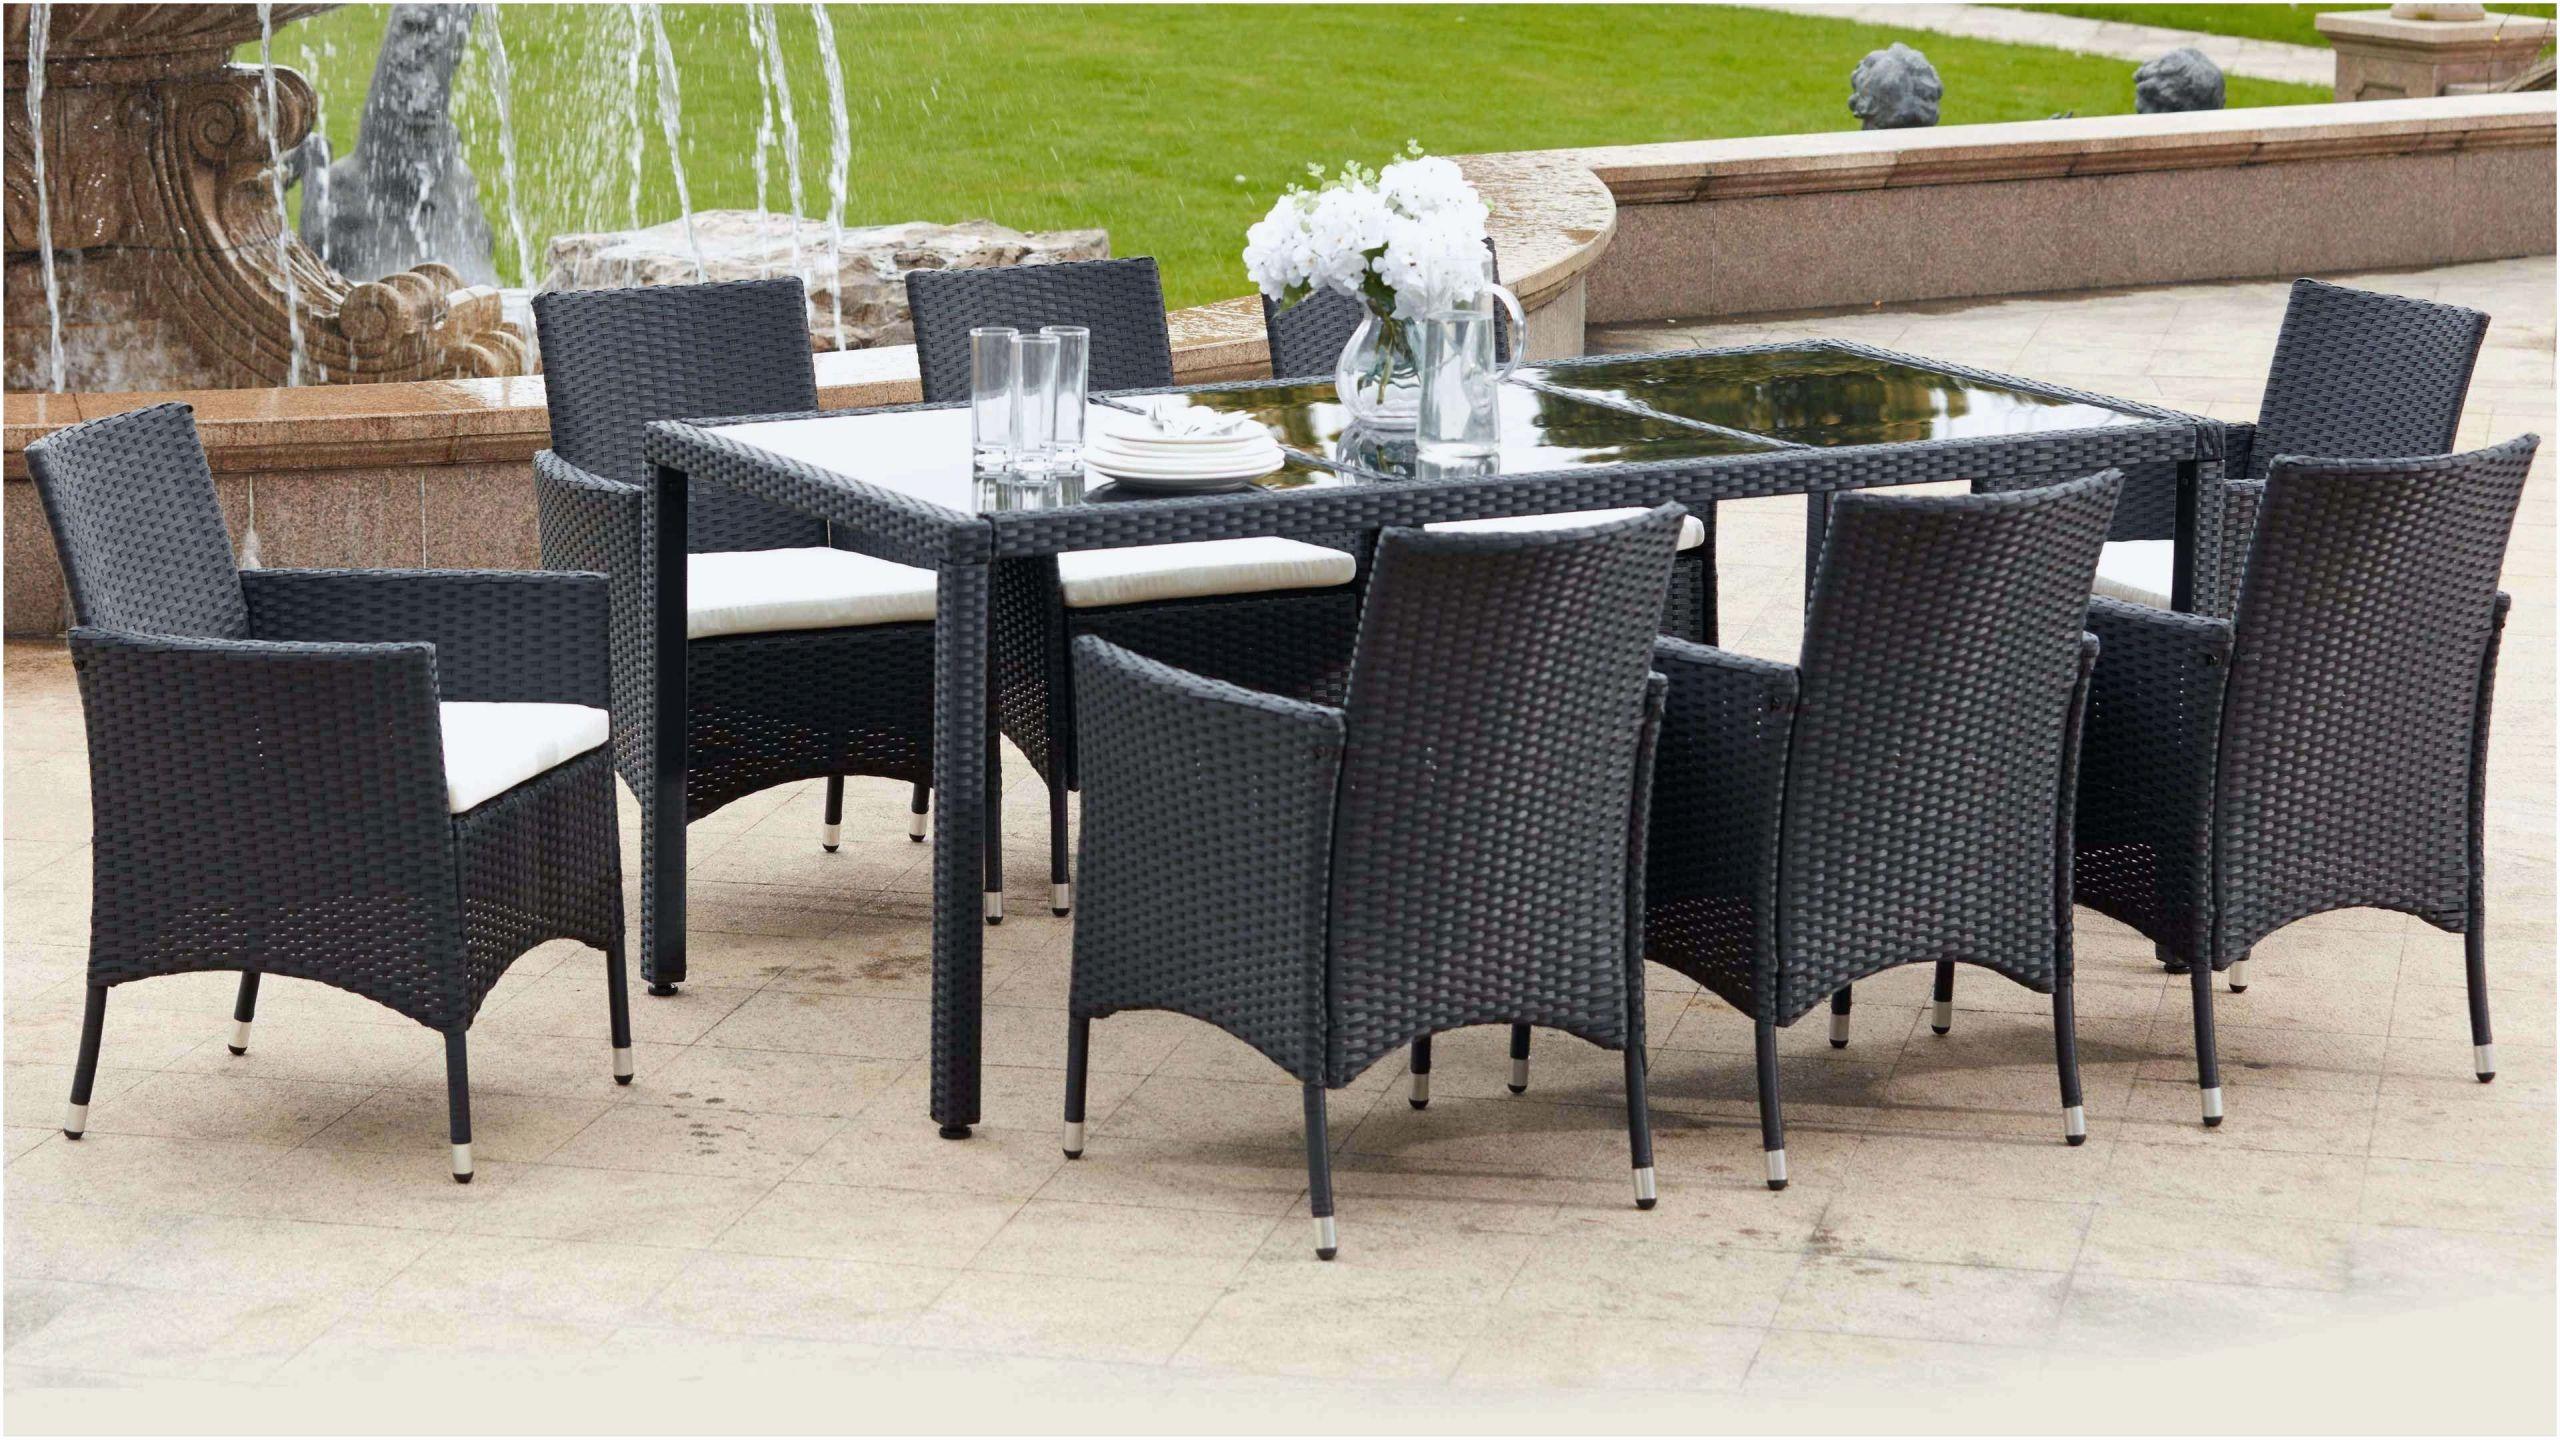 Chaises De Jardin Gifi Génial Table Picnic Pliante Gifi ...